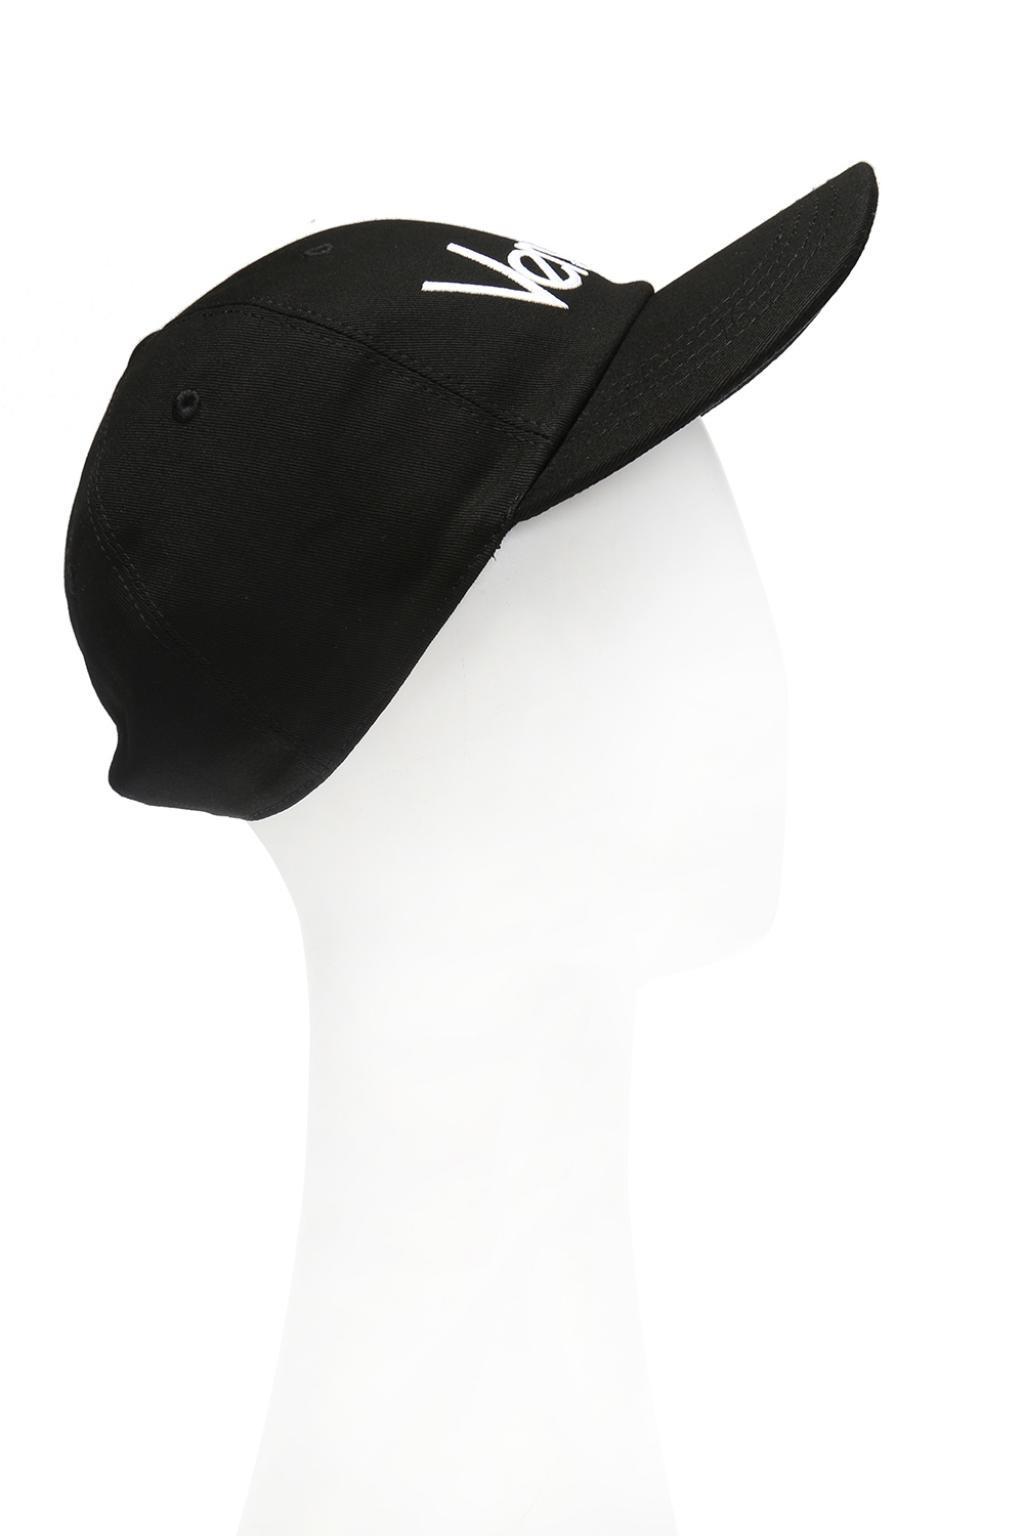 Versace - Black Branded Baseball Cap for Men - Lyst. View fullscreen c0fcc12b3c0b